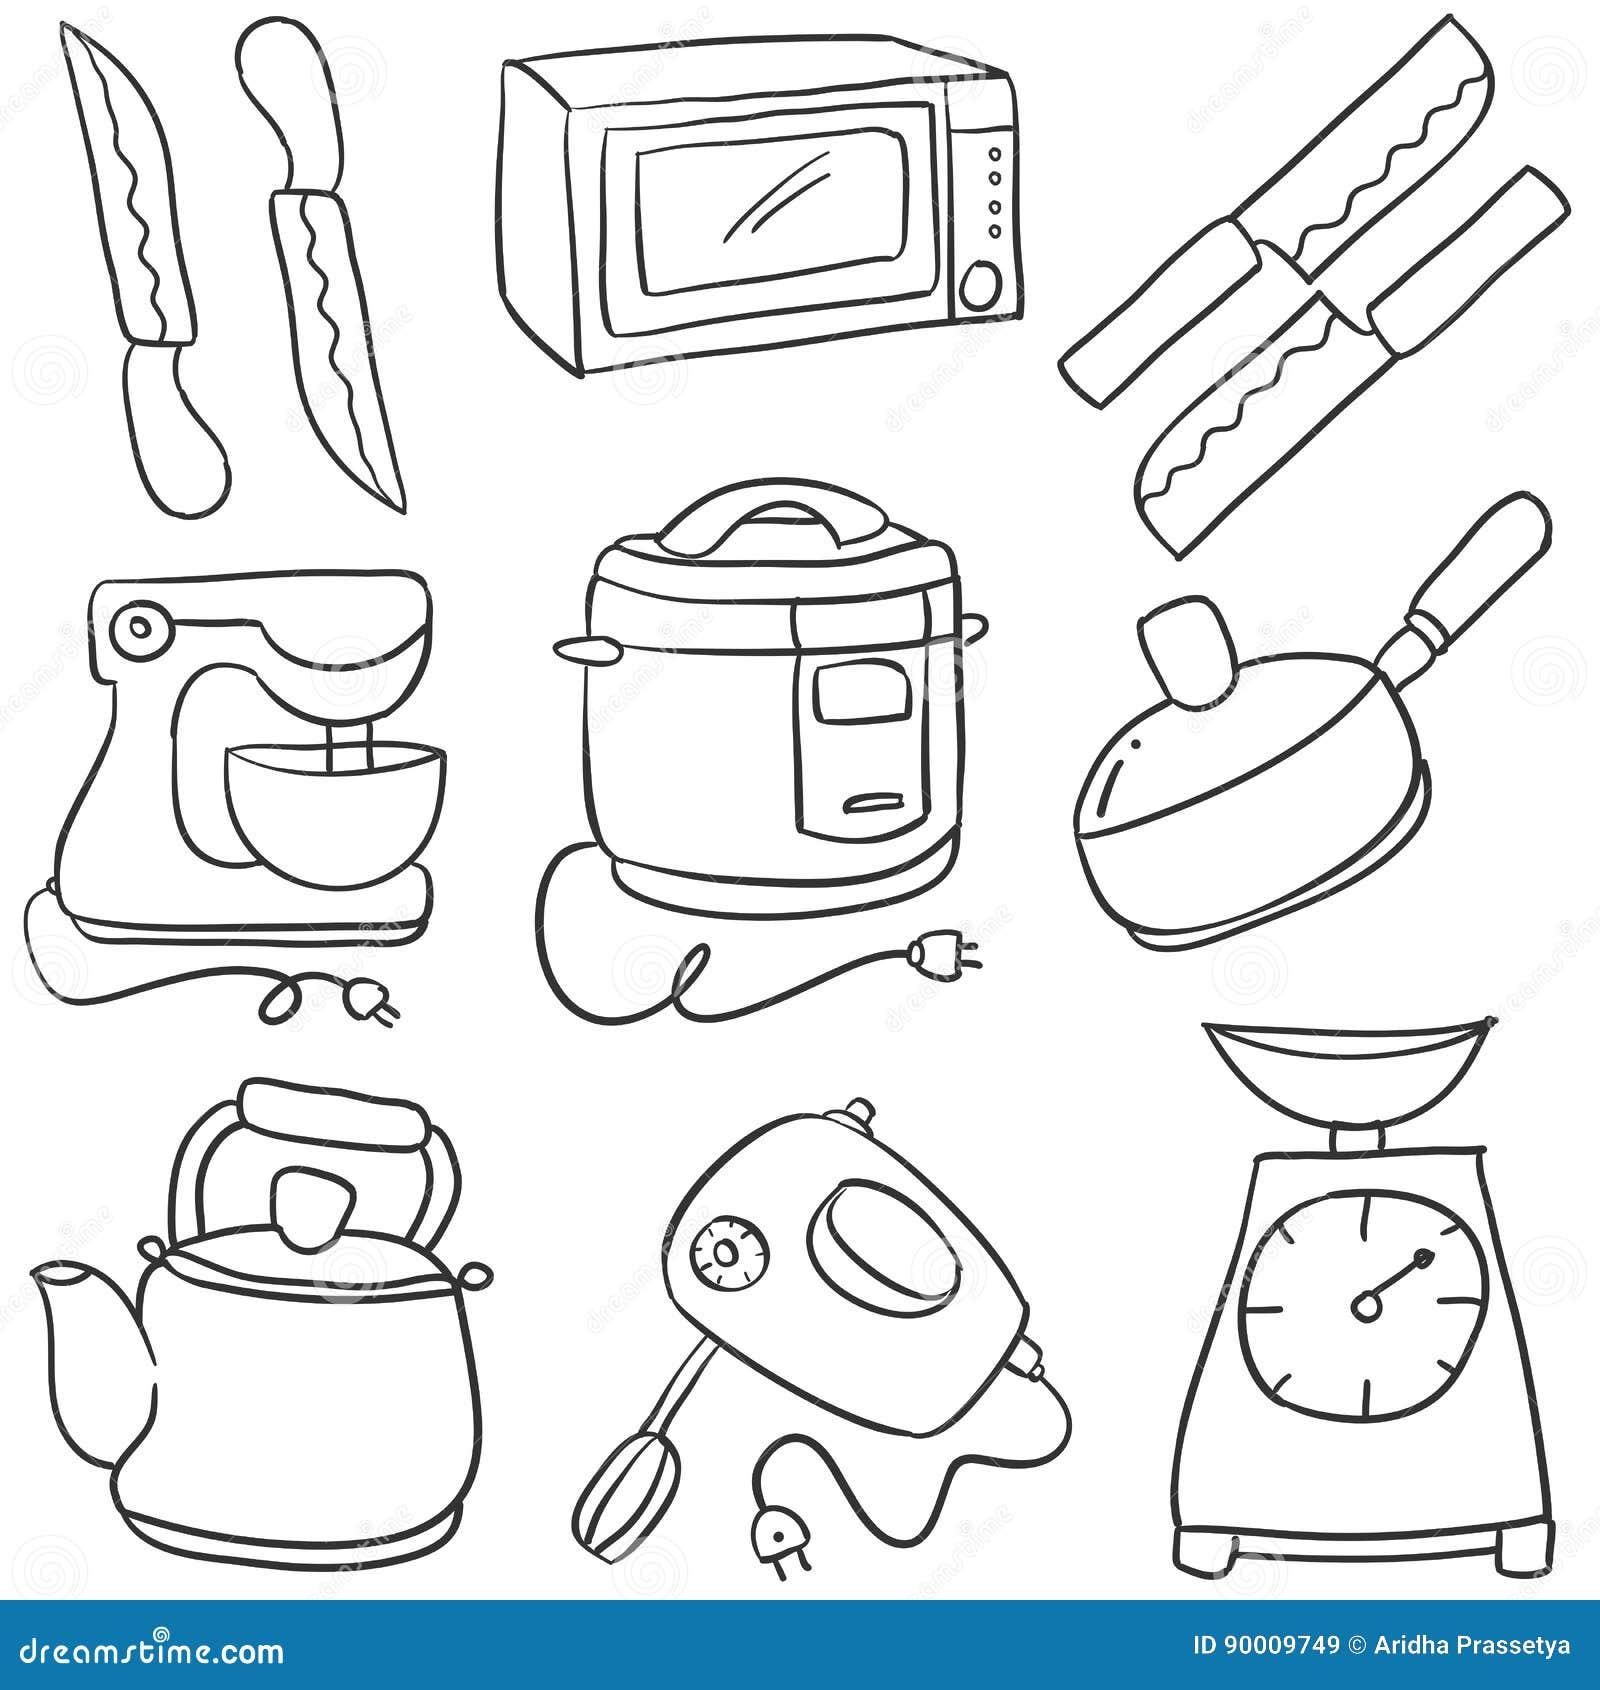 Doodle Of Kitchen Set Style Cartoon Stock Vector Illustration Of